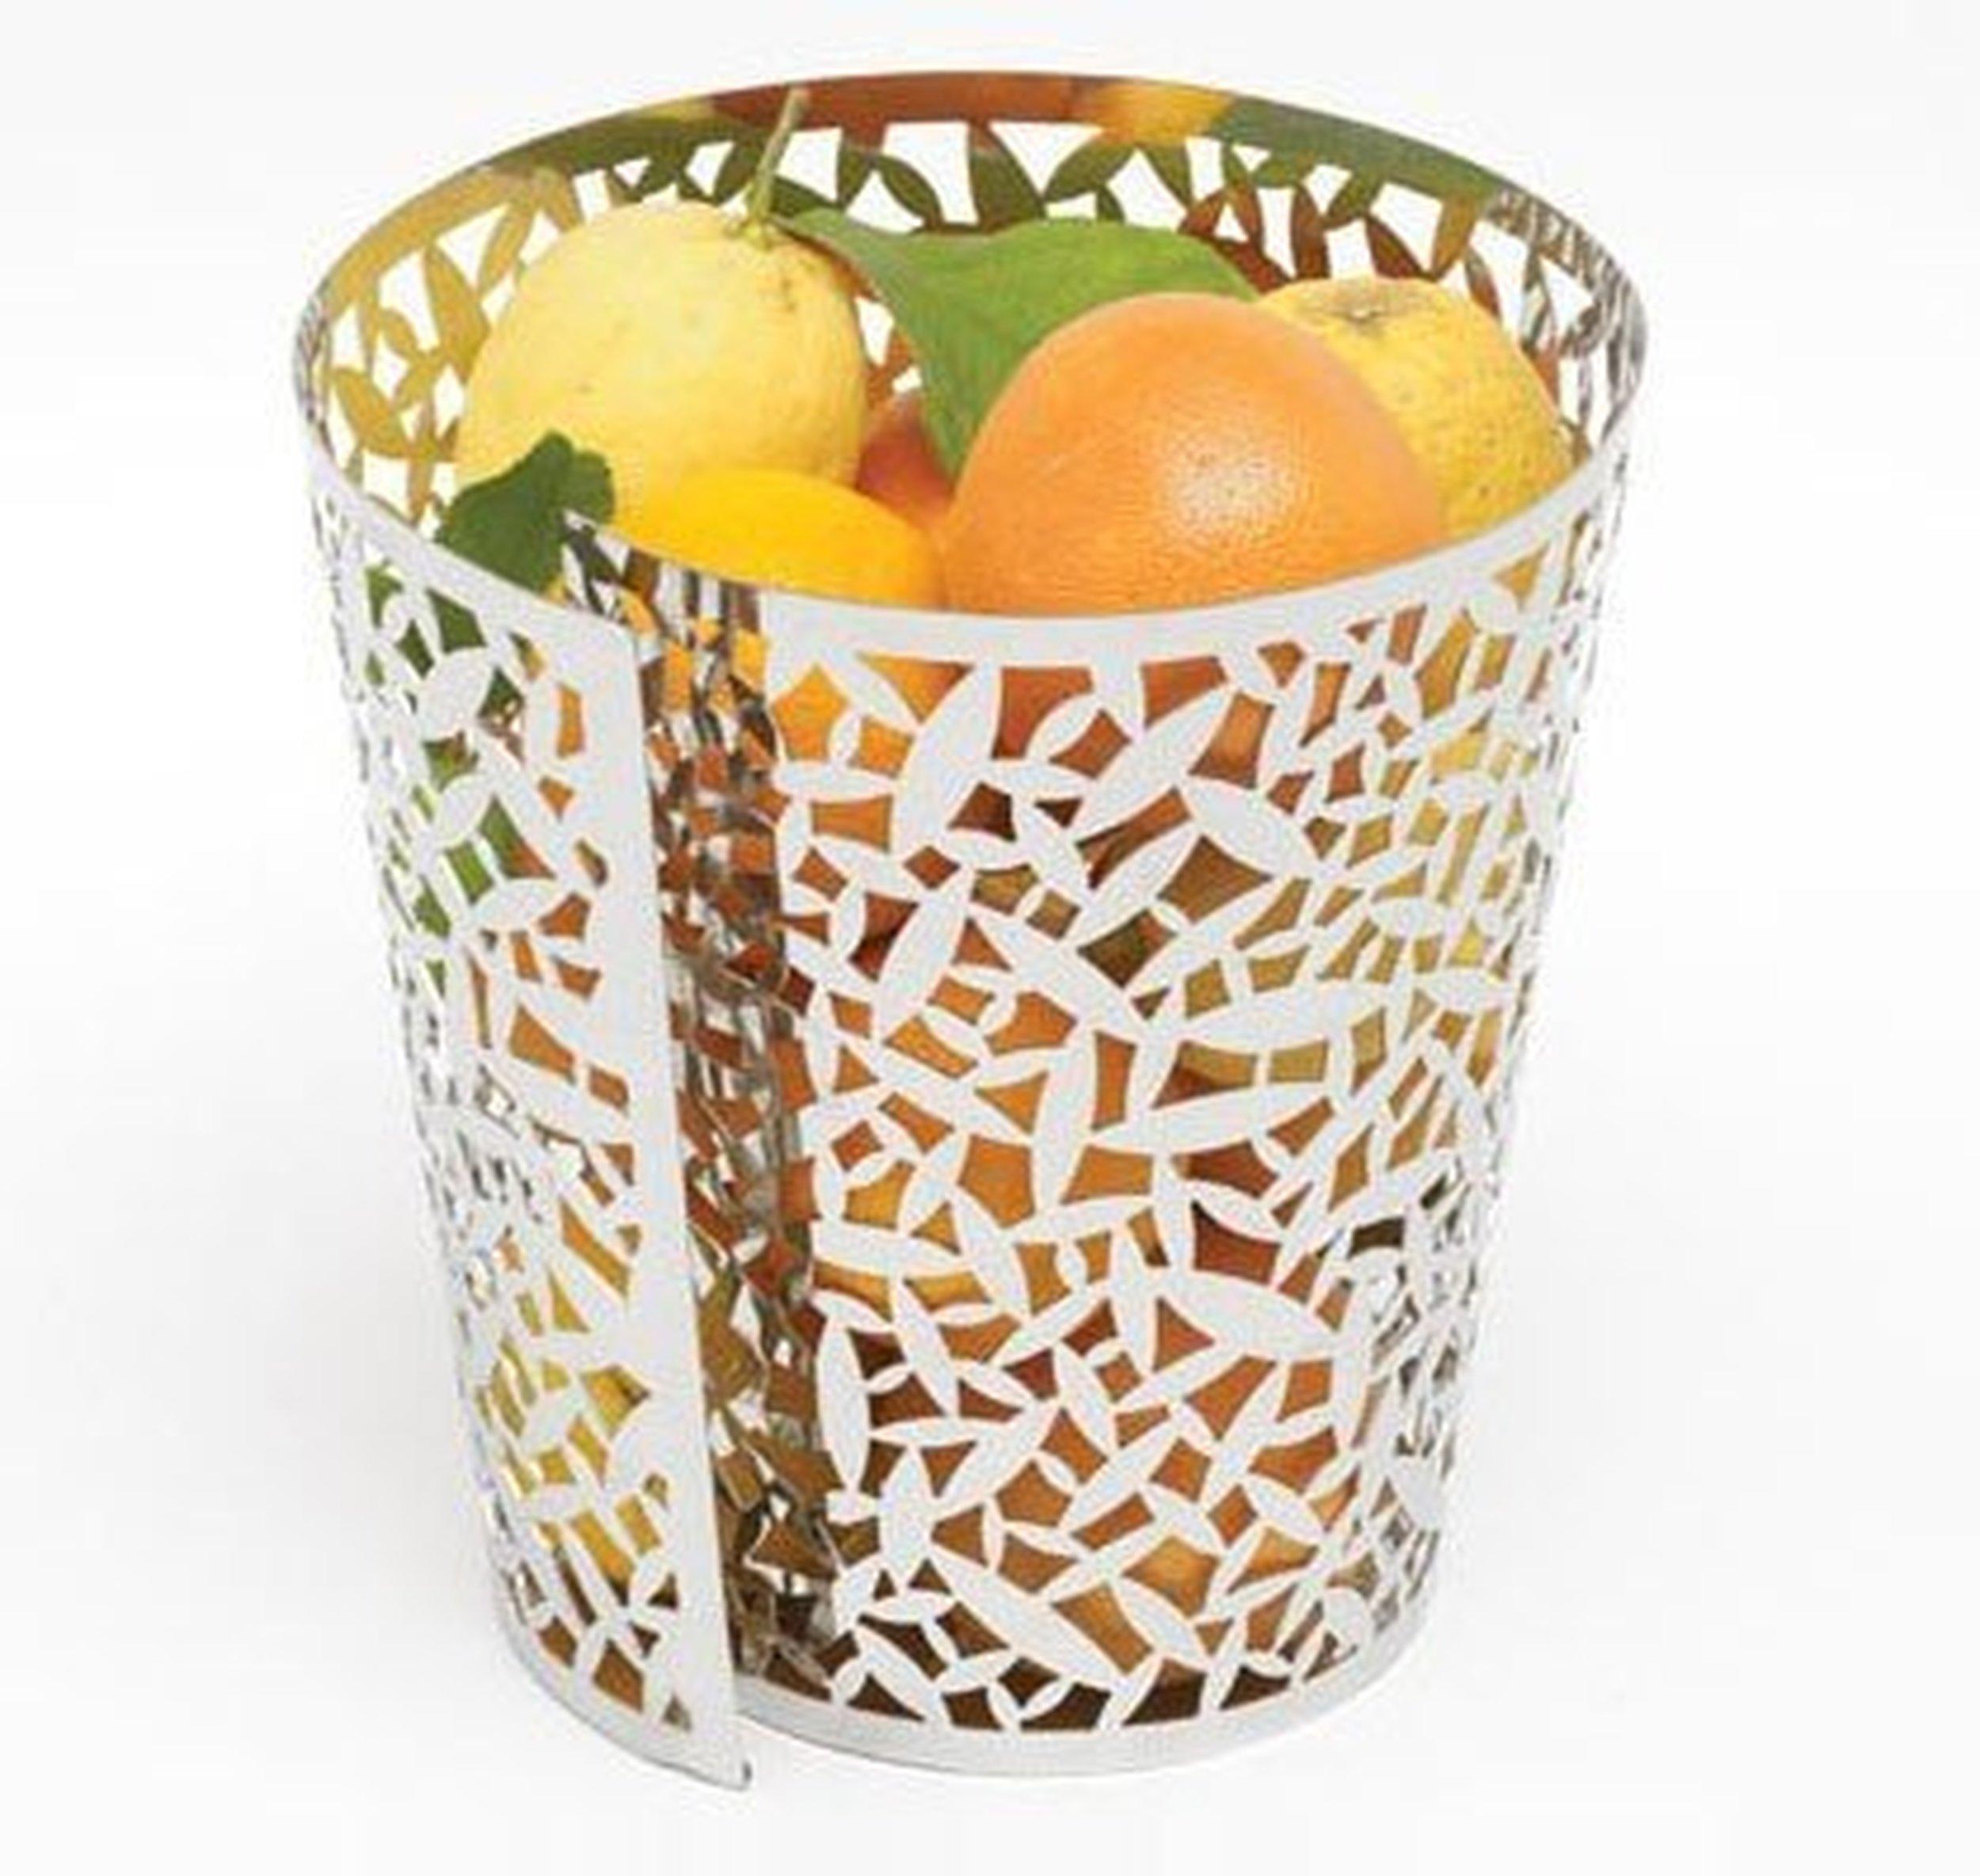 Cactus fruit basket alessi - Alessi fruit basket ...